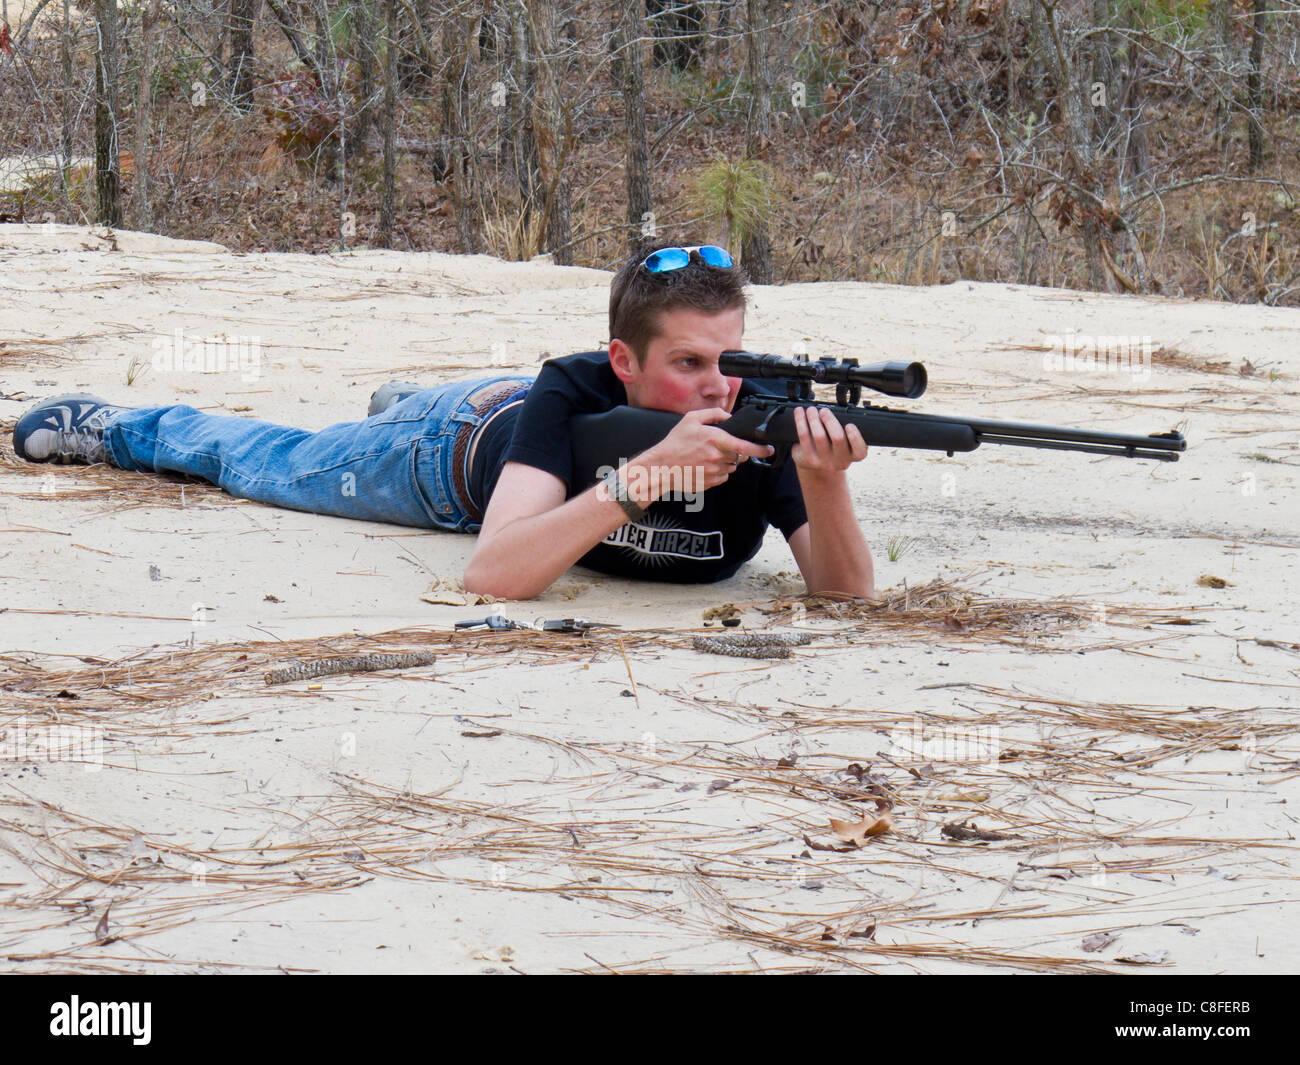 Teen male lying on ground shooting .22 caliber rifle with scope in Ocala, Florida, USA - Stock Image